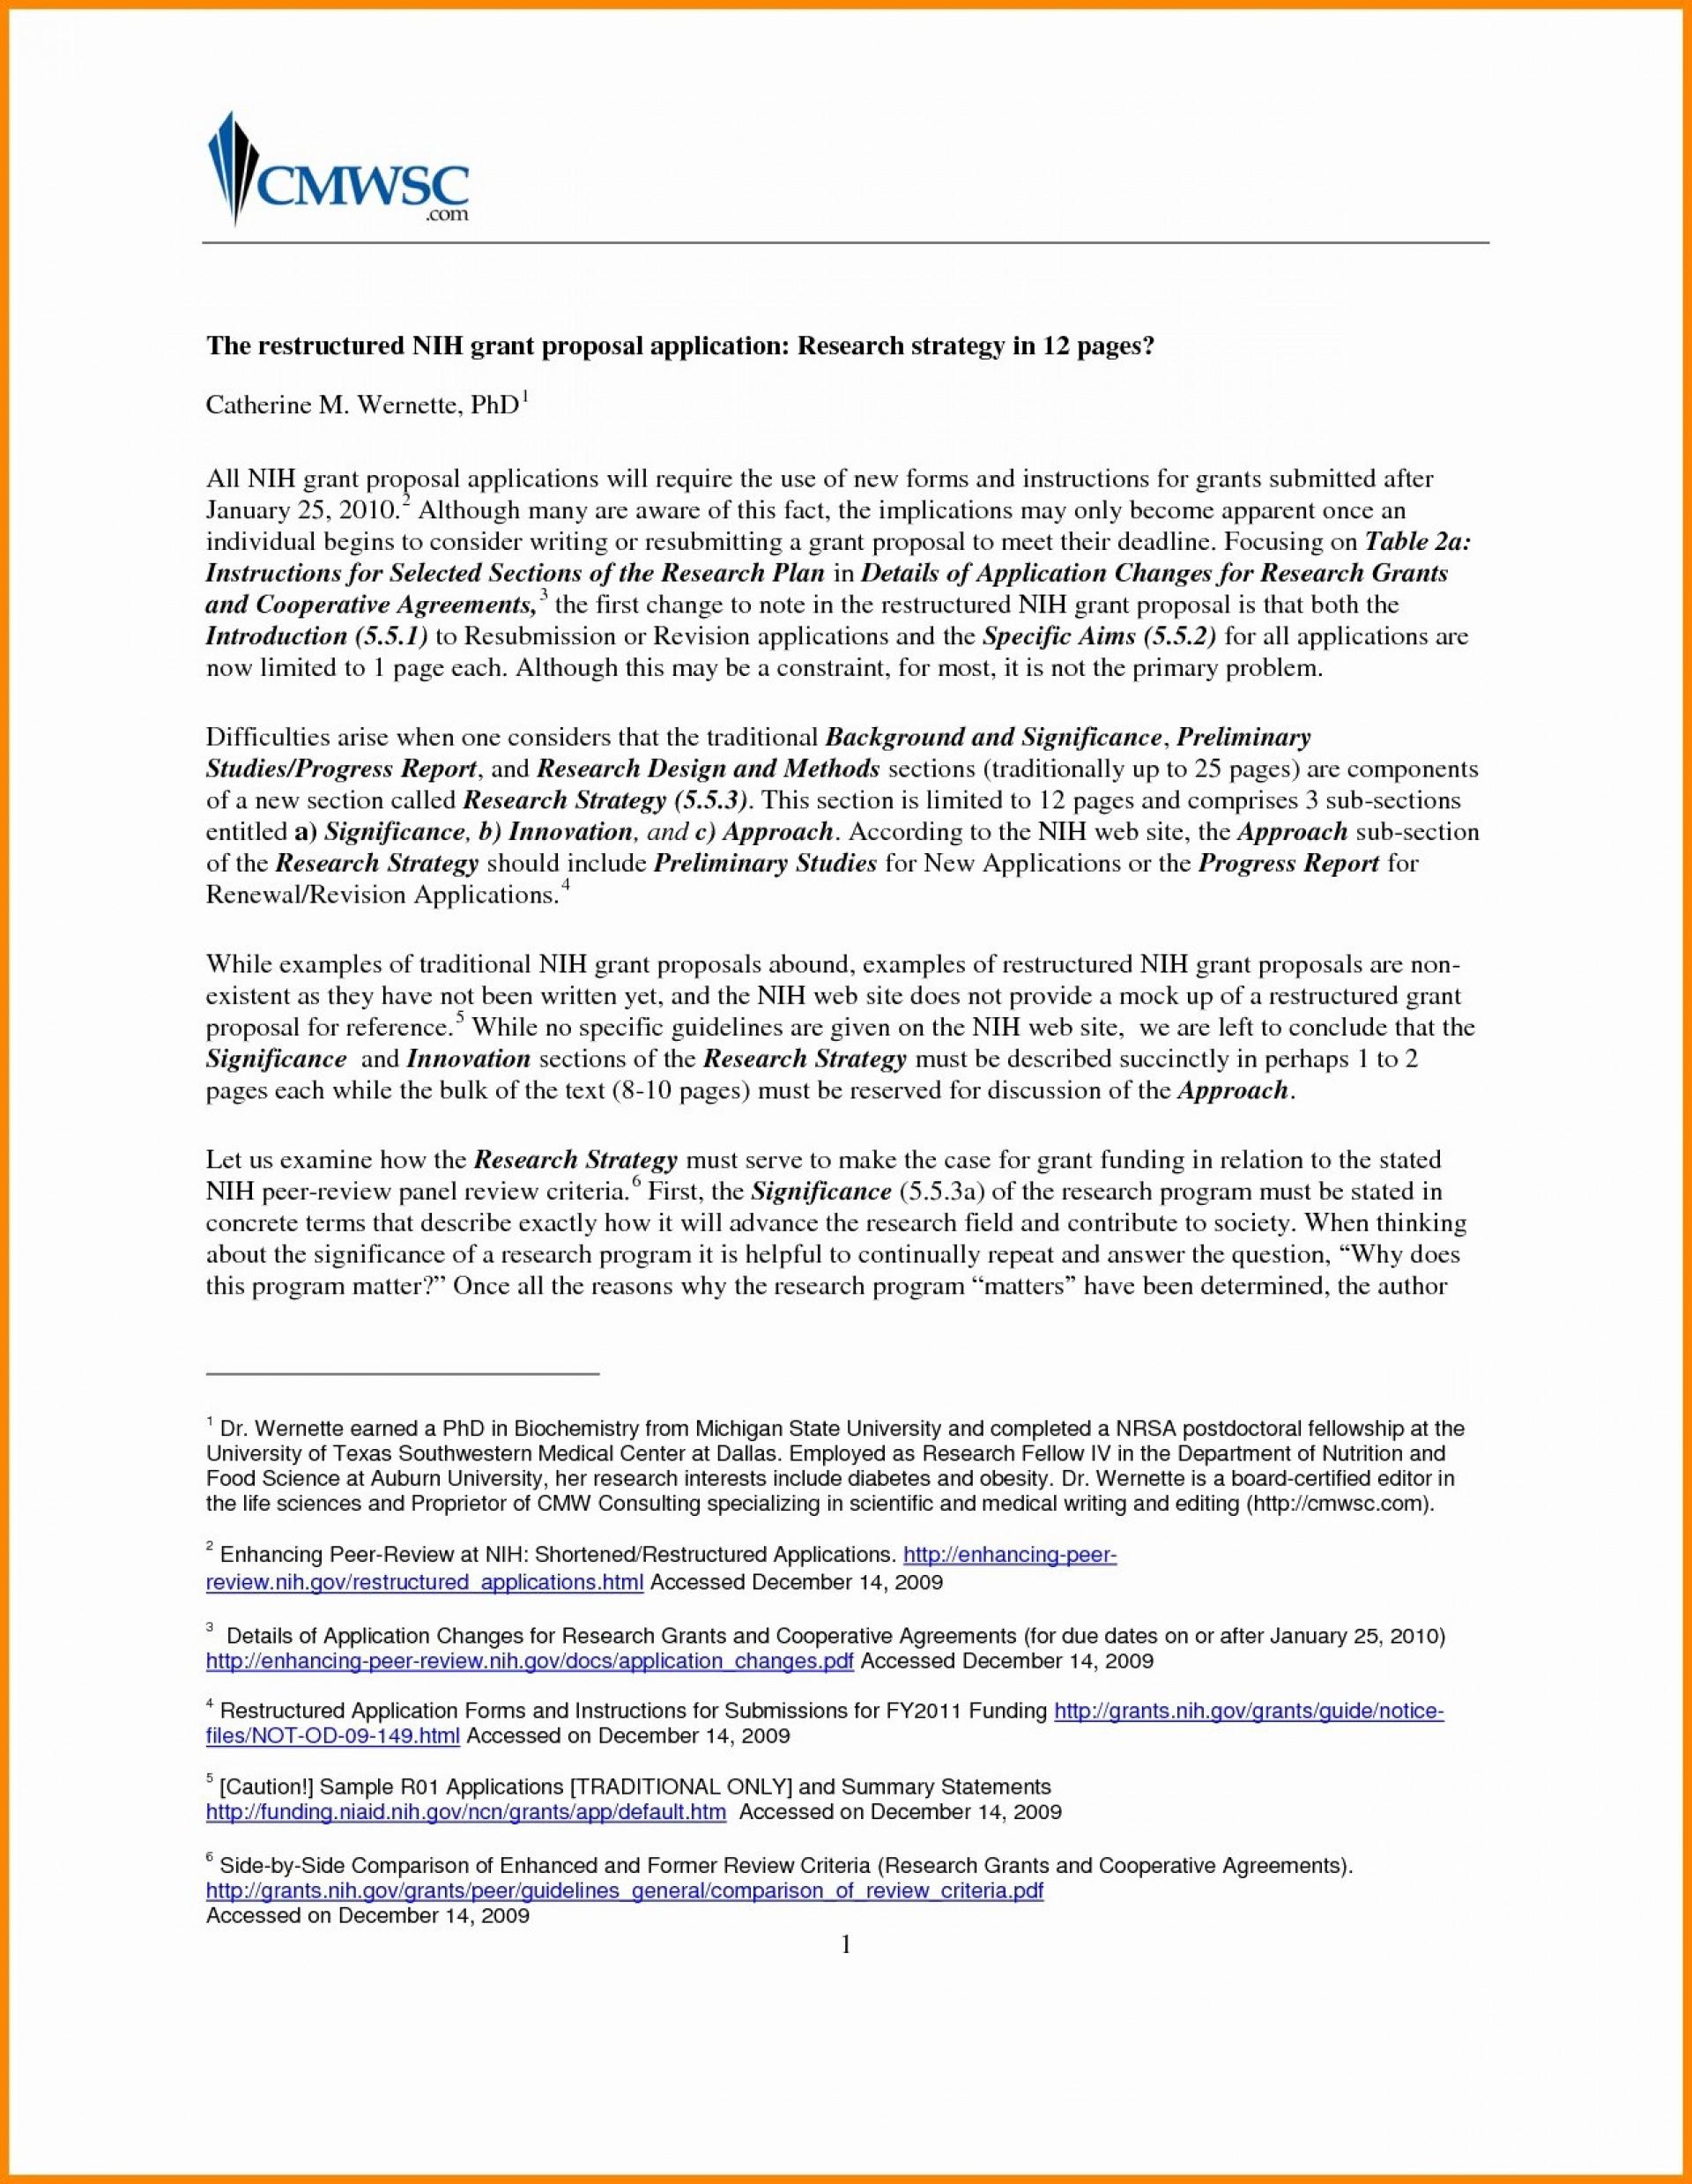 006 press release template google docs elegant fer letter samples of 1920x2479